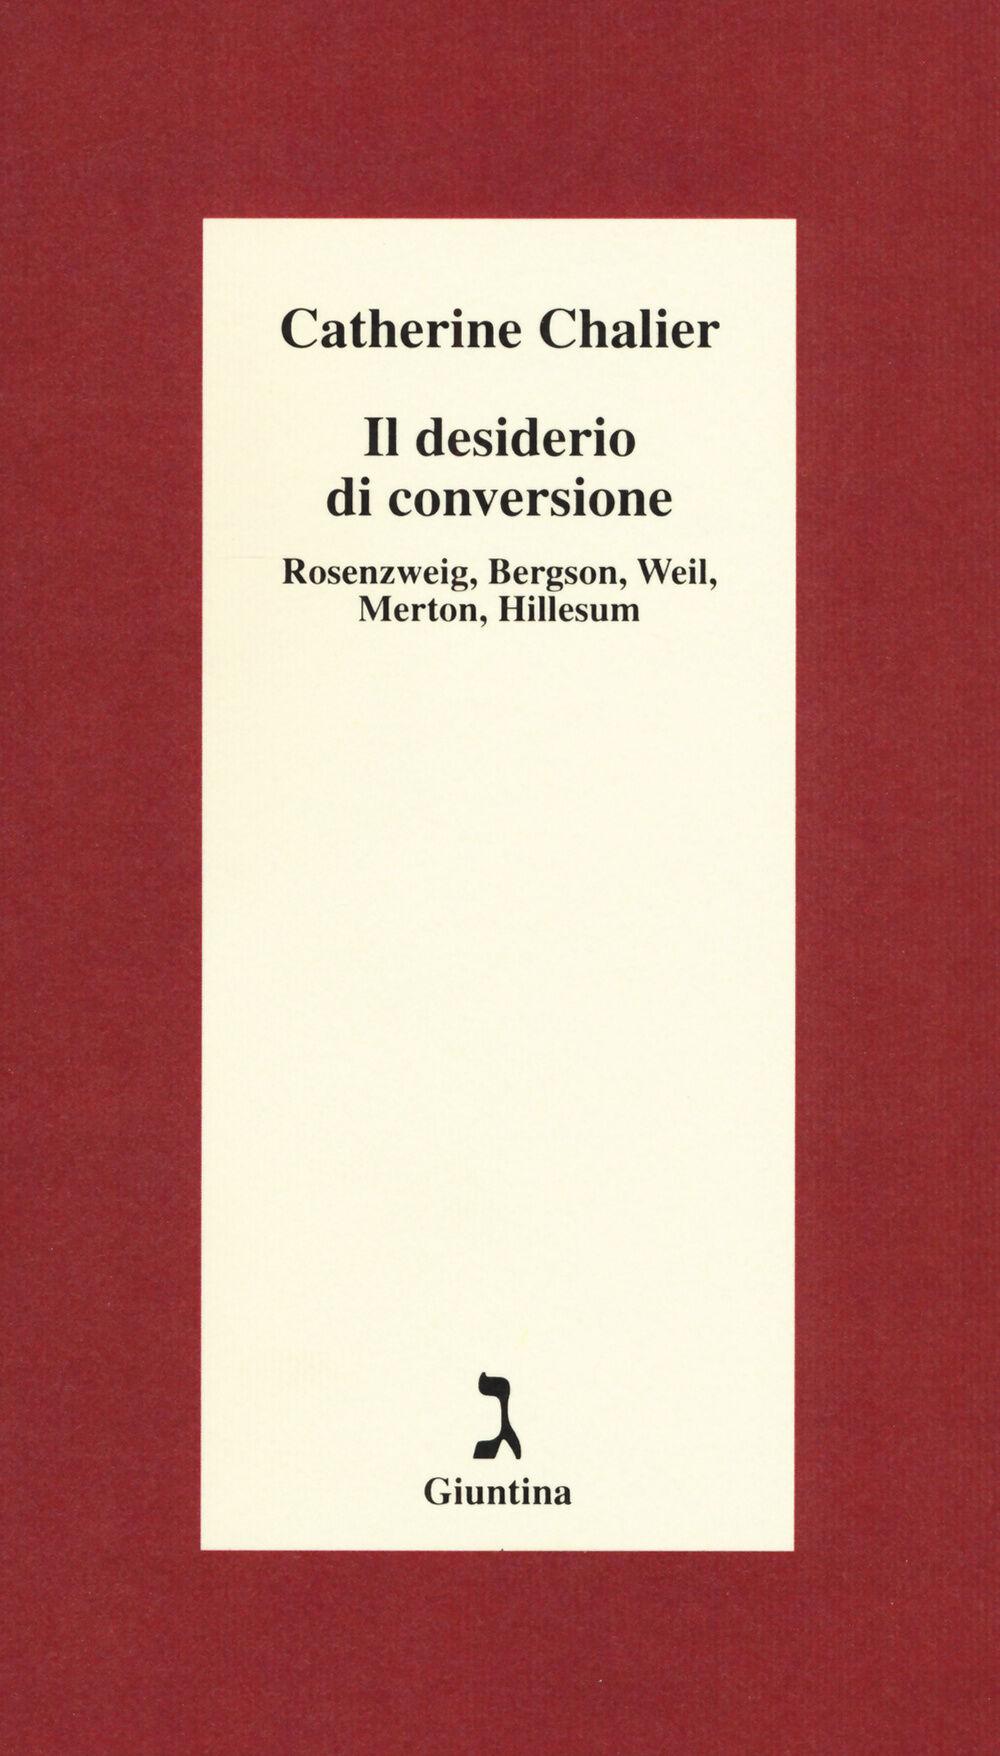 Il desiderio di conversione. Rosenzweig, Bergson, Weil, Merton, Hillesum